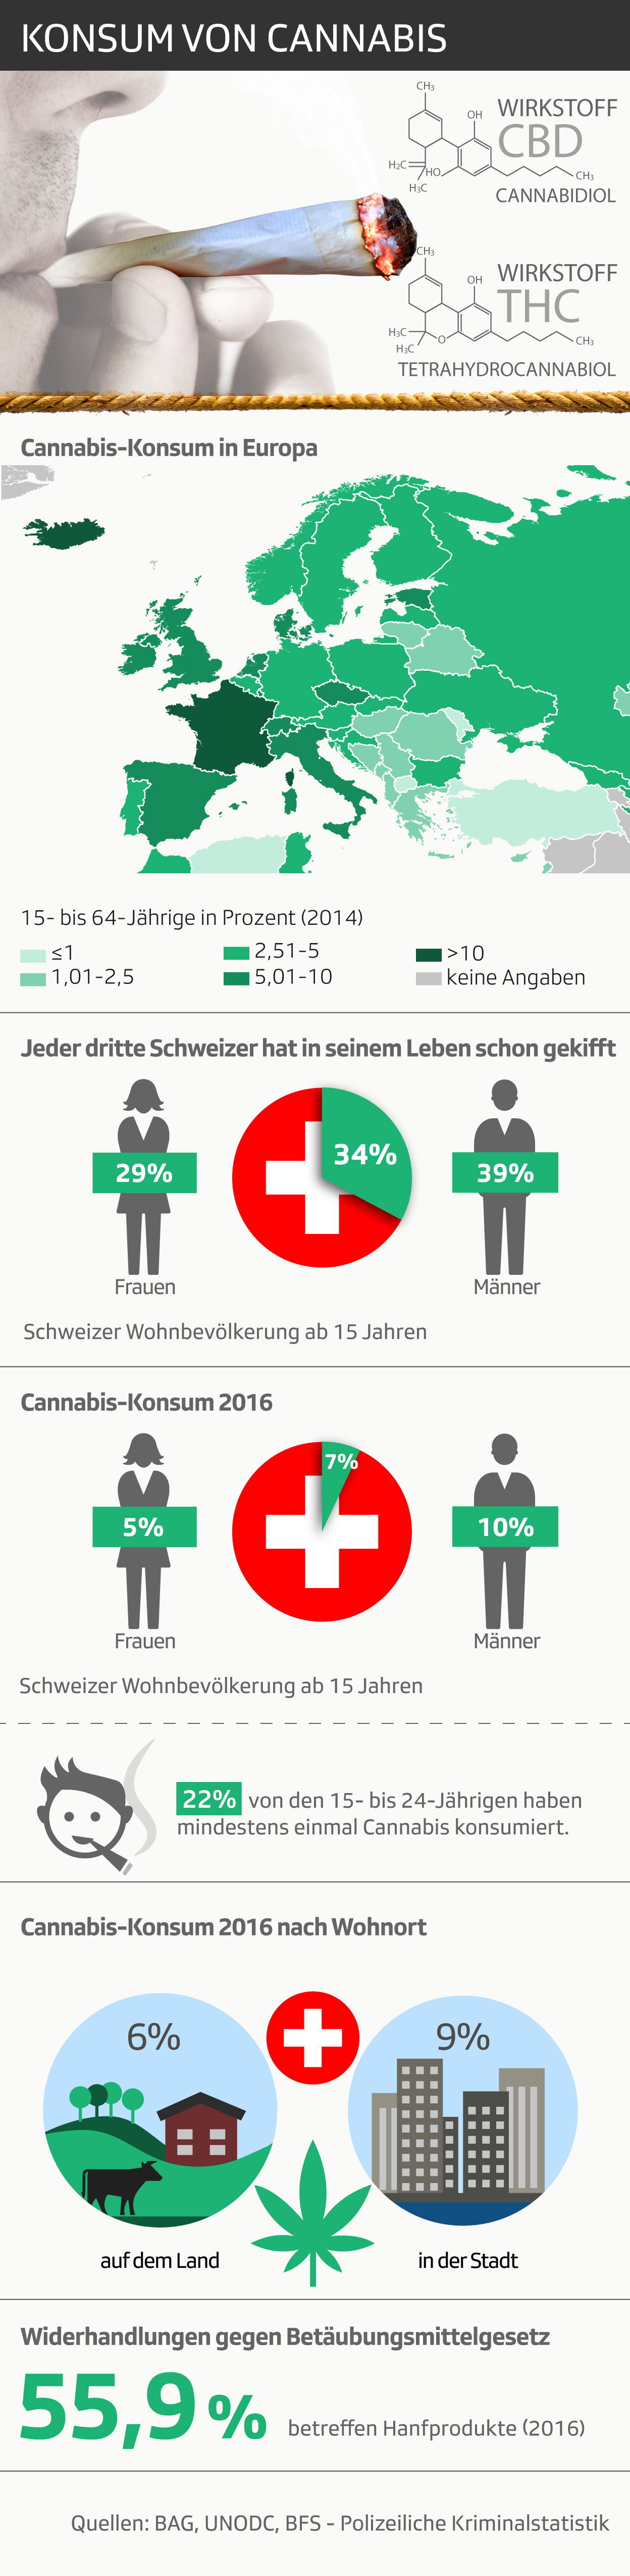 Infografik: Cannabis